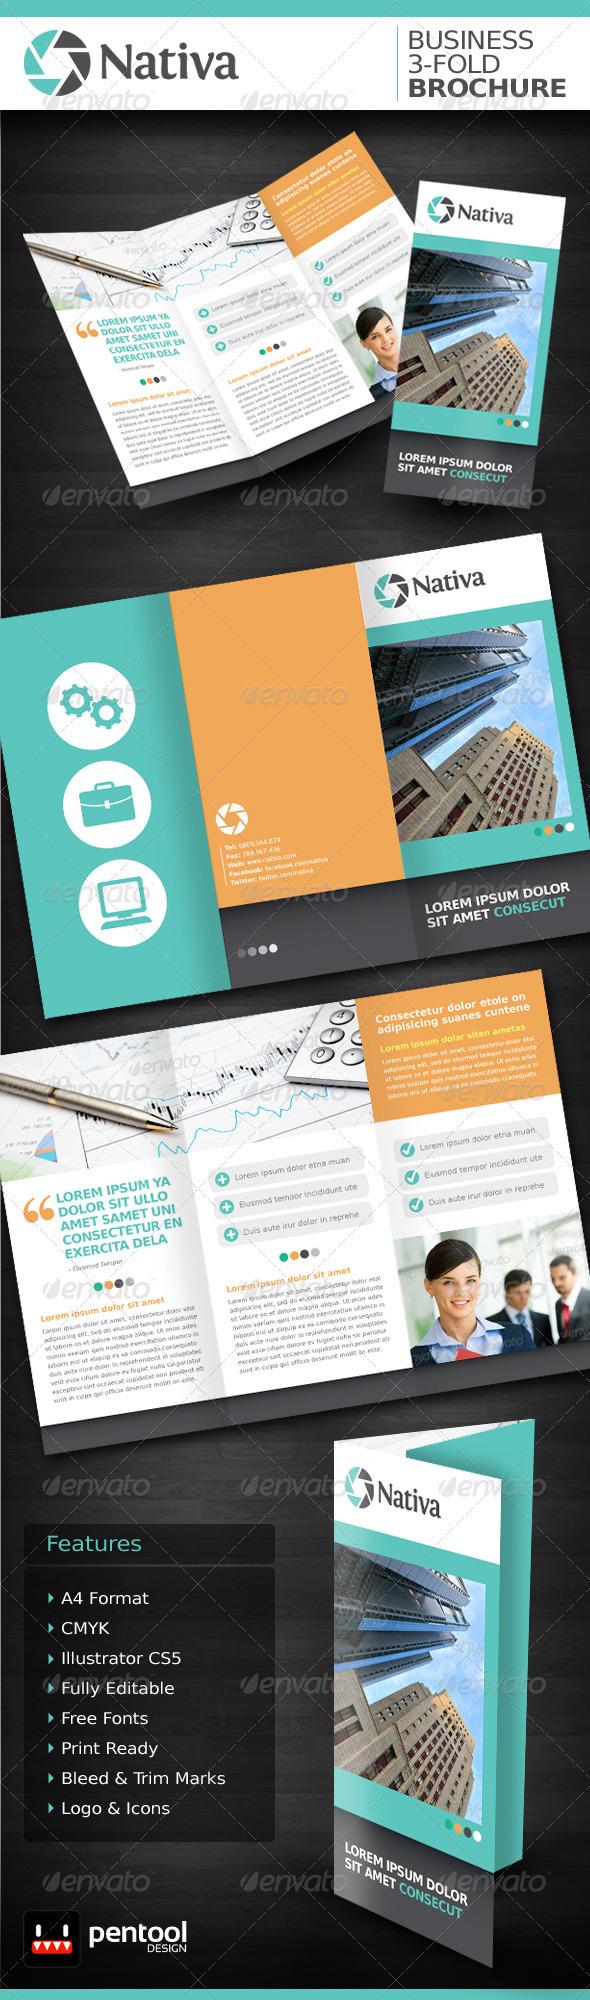 Nativa Business 3-Fold Brochure - Corporate Brochures